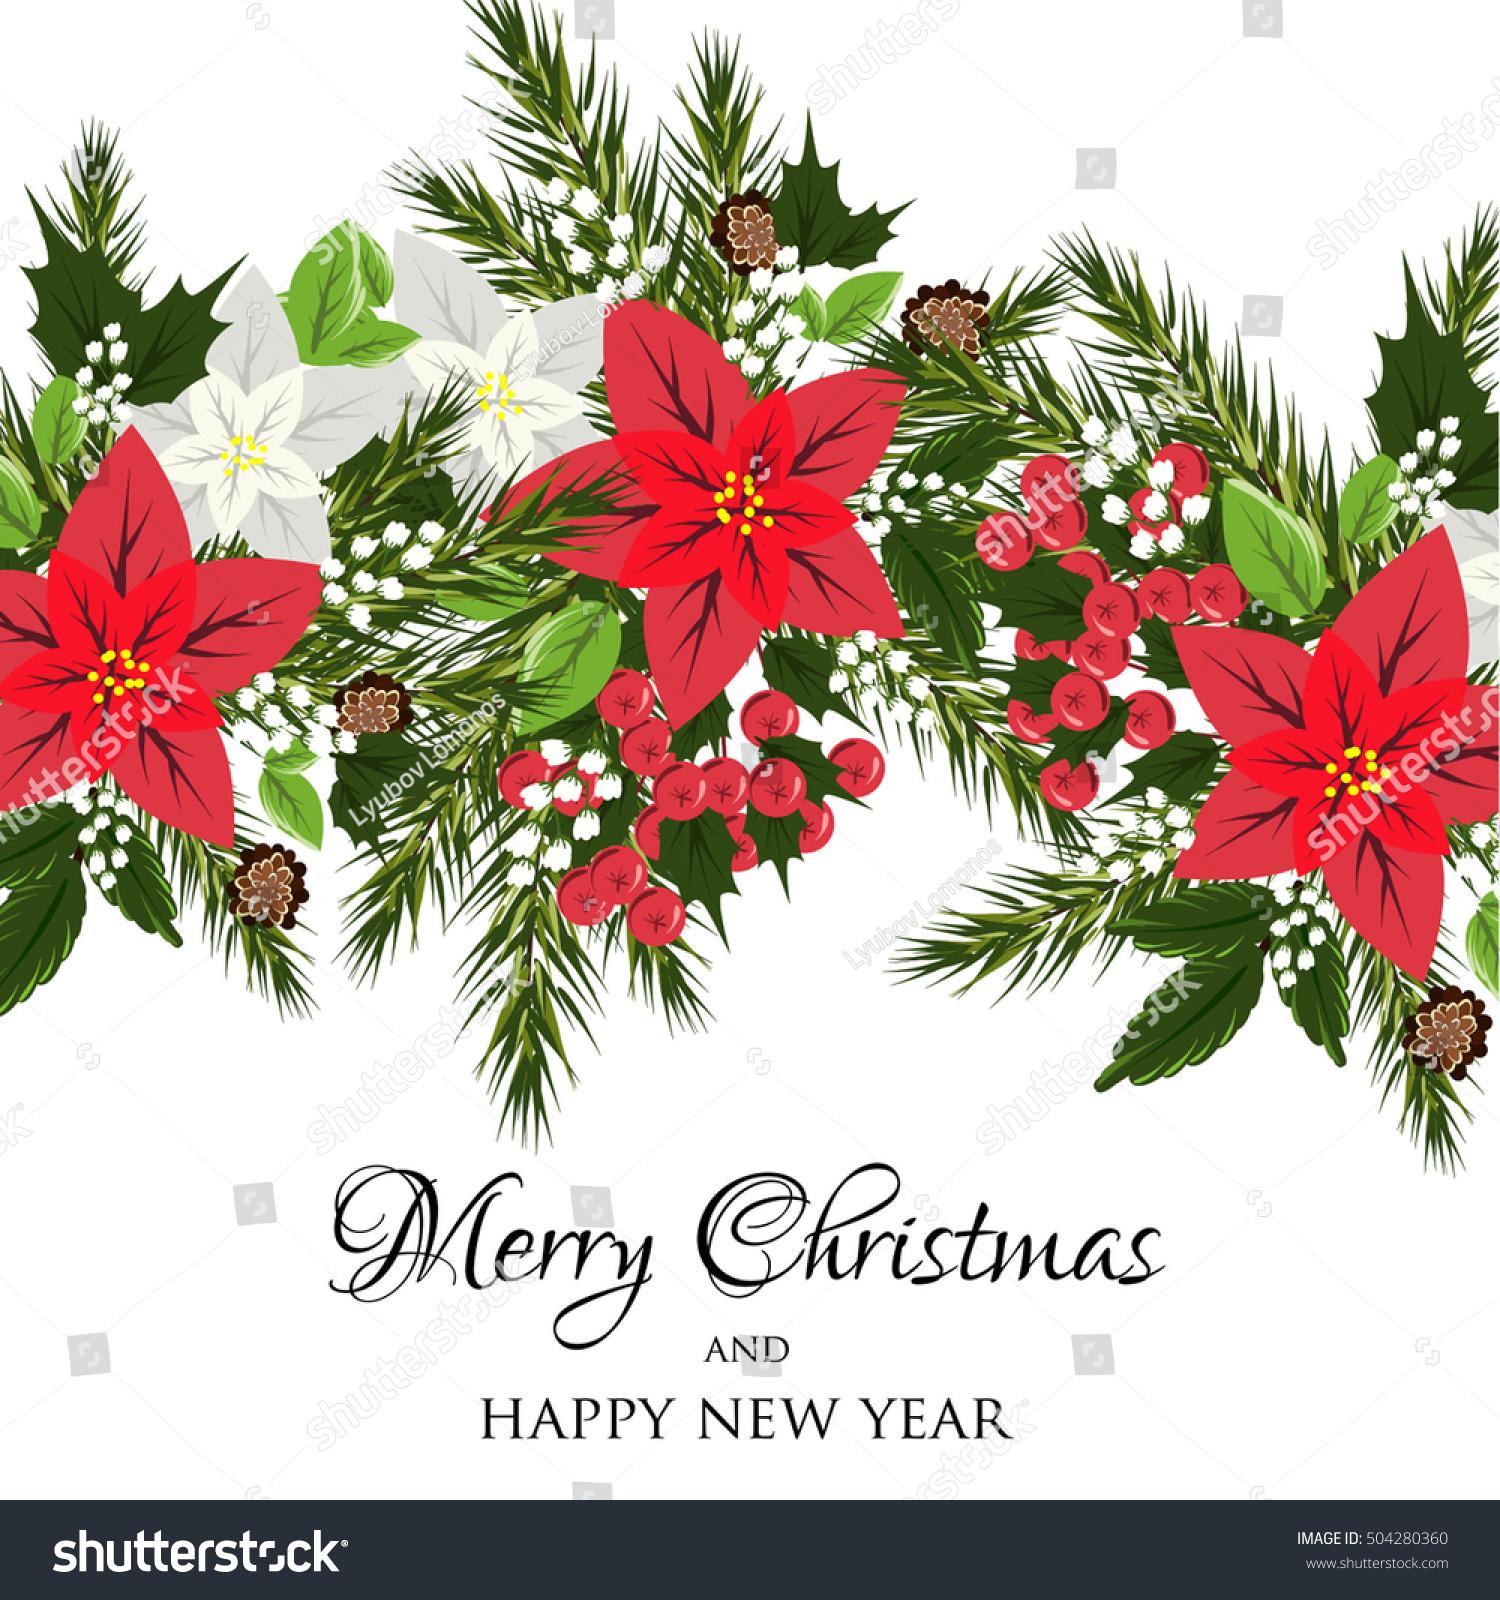 Christmas Party Invitation Holiday Wreath Poinsettia Stock Vector ...